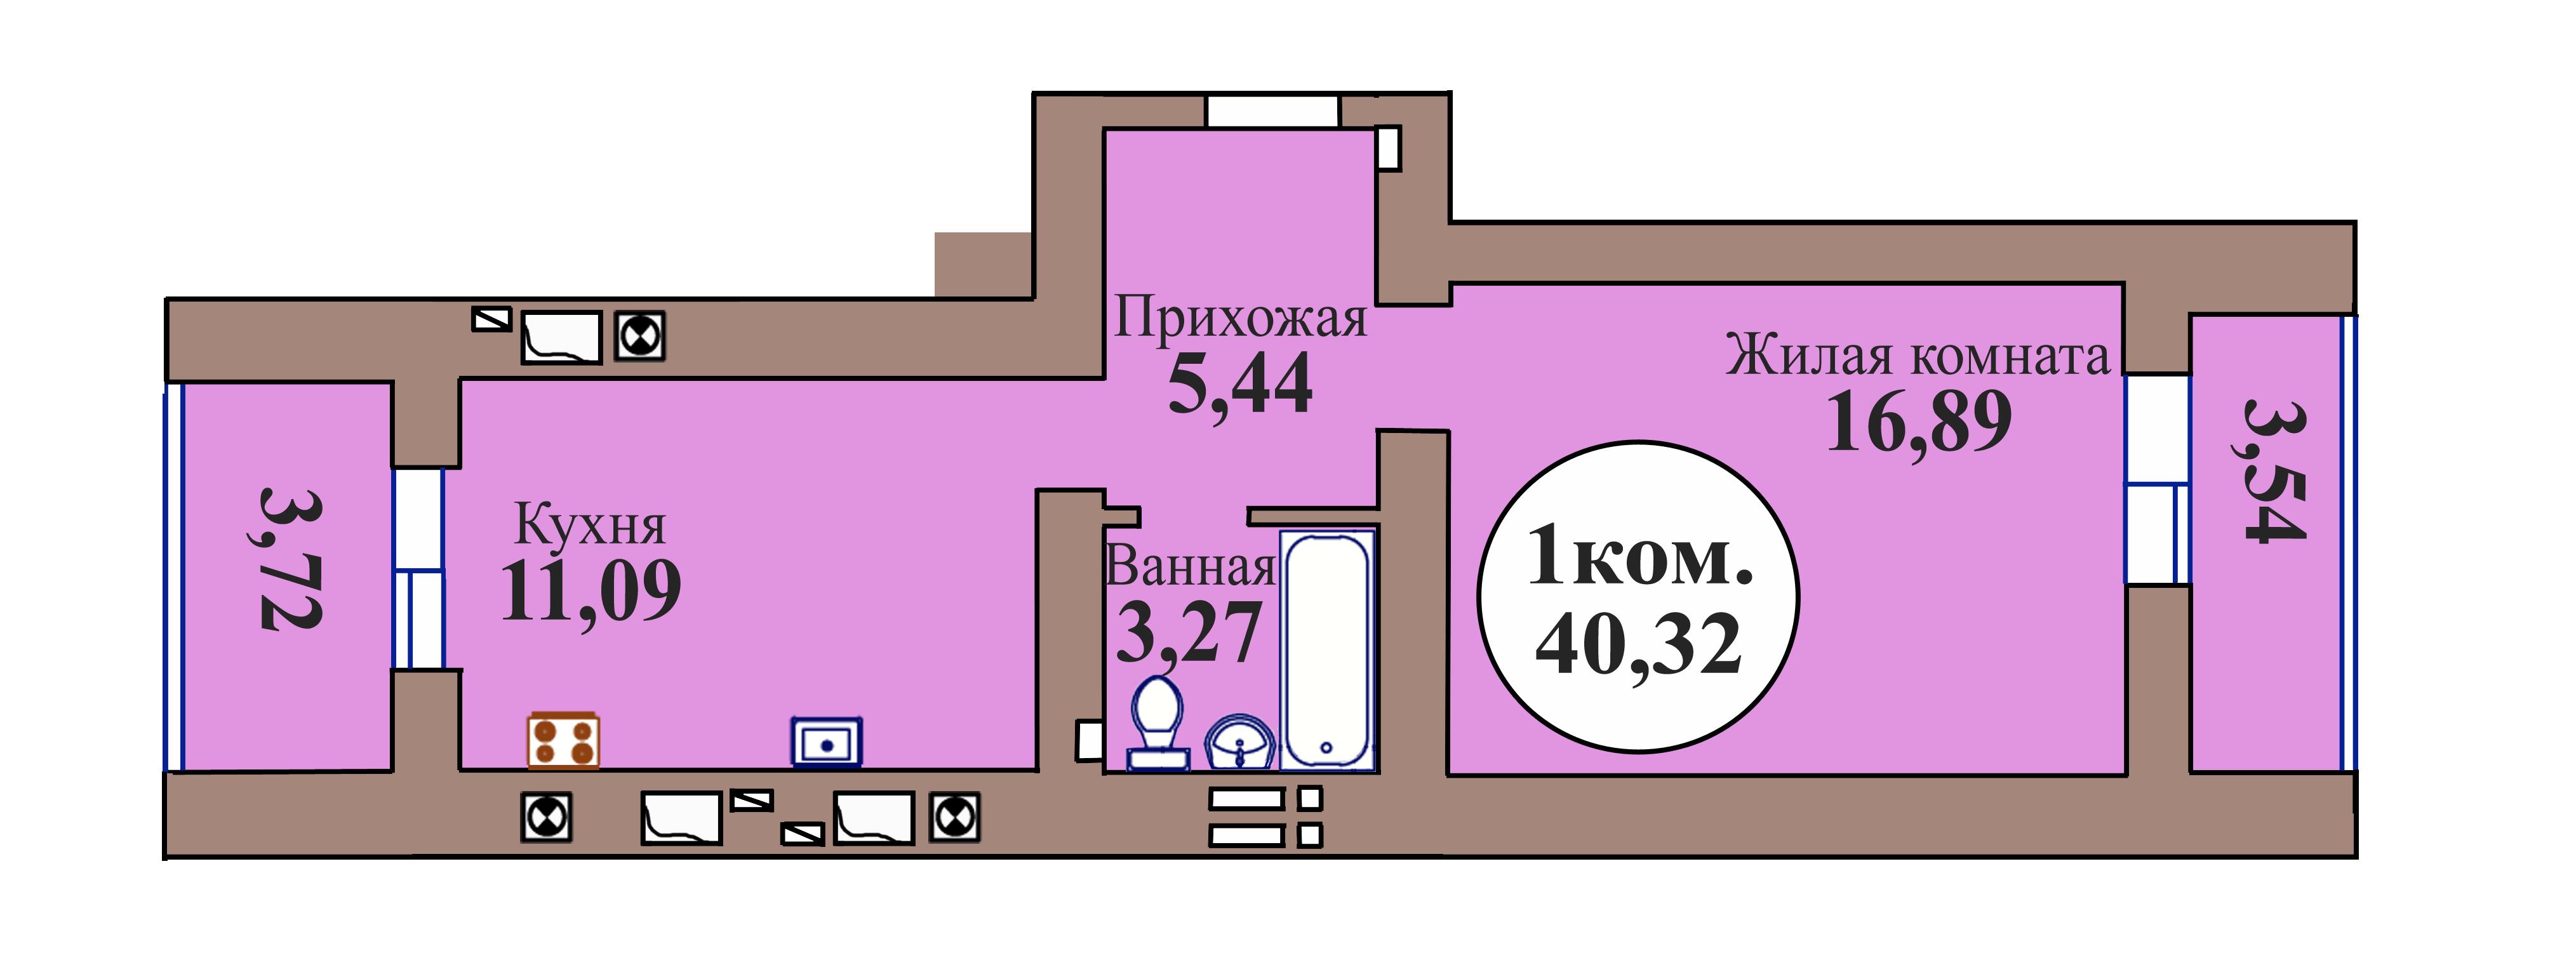 1-комн. кв. по пер. Калининградский, 5 кв. 2 в Калининграде